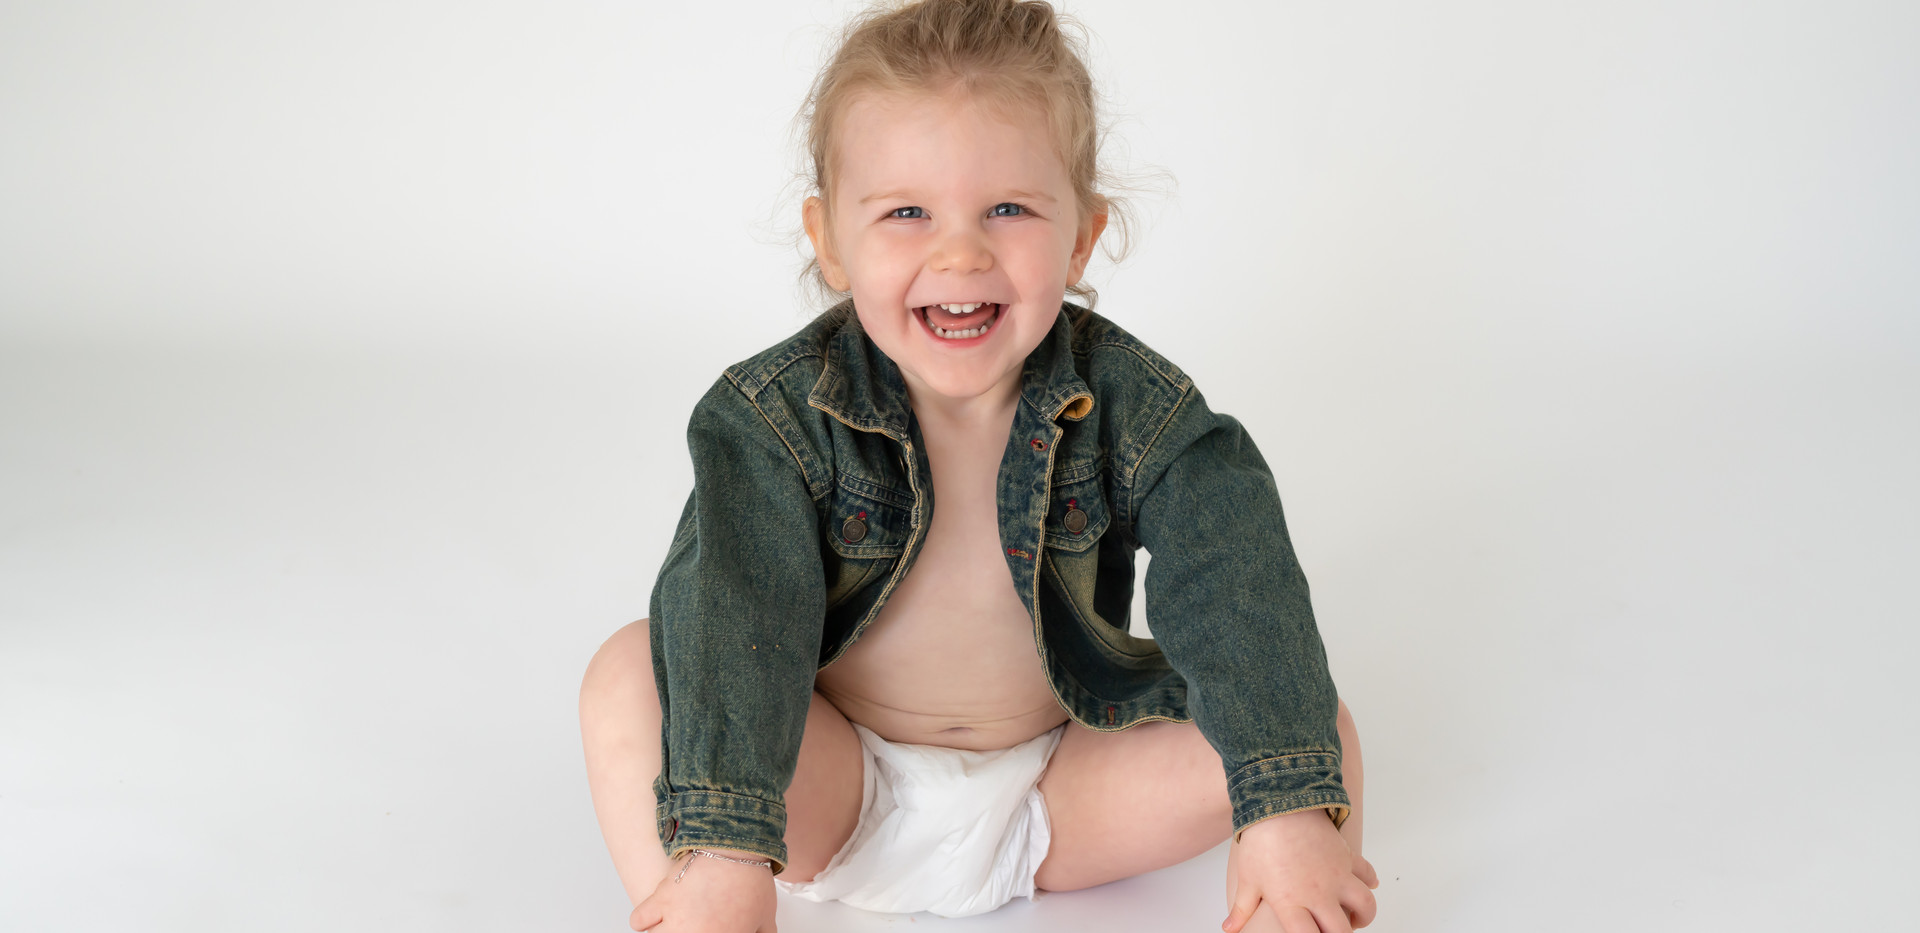 photographe enfant Rennes.jpg